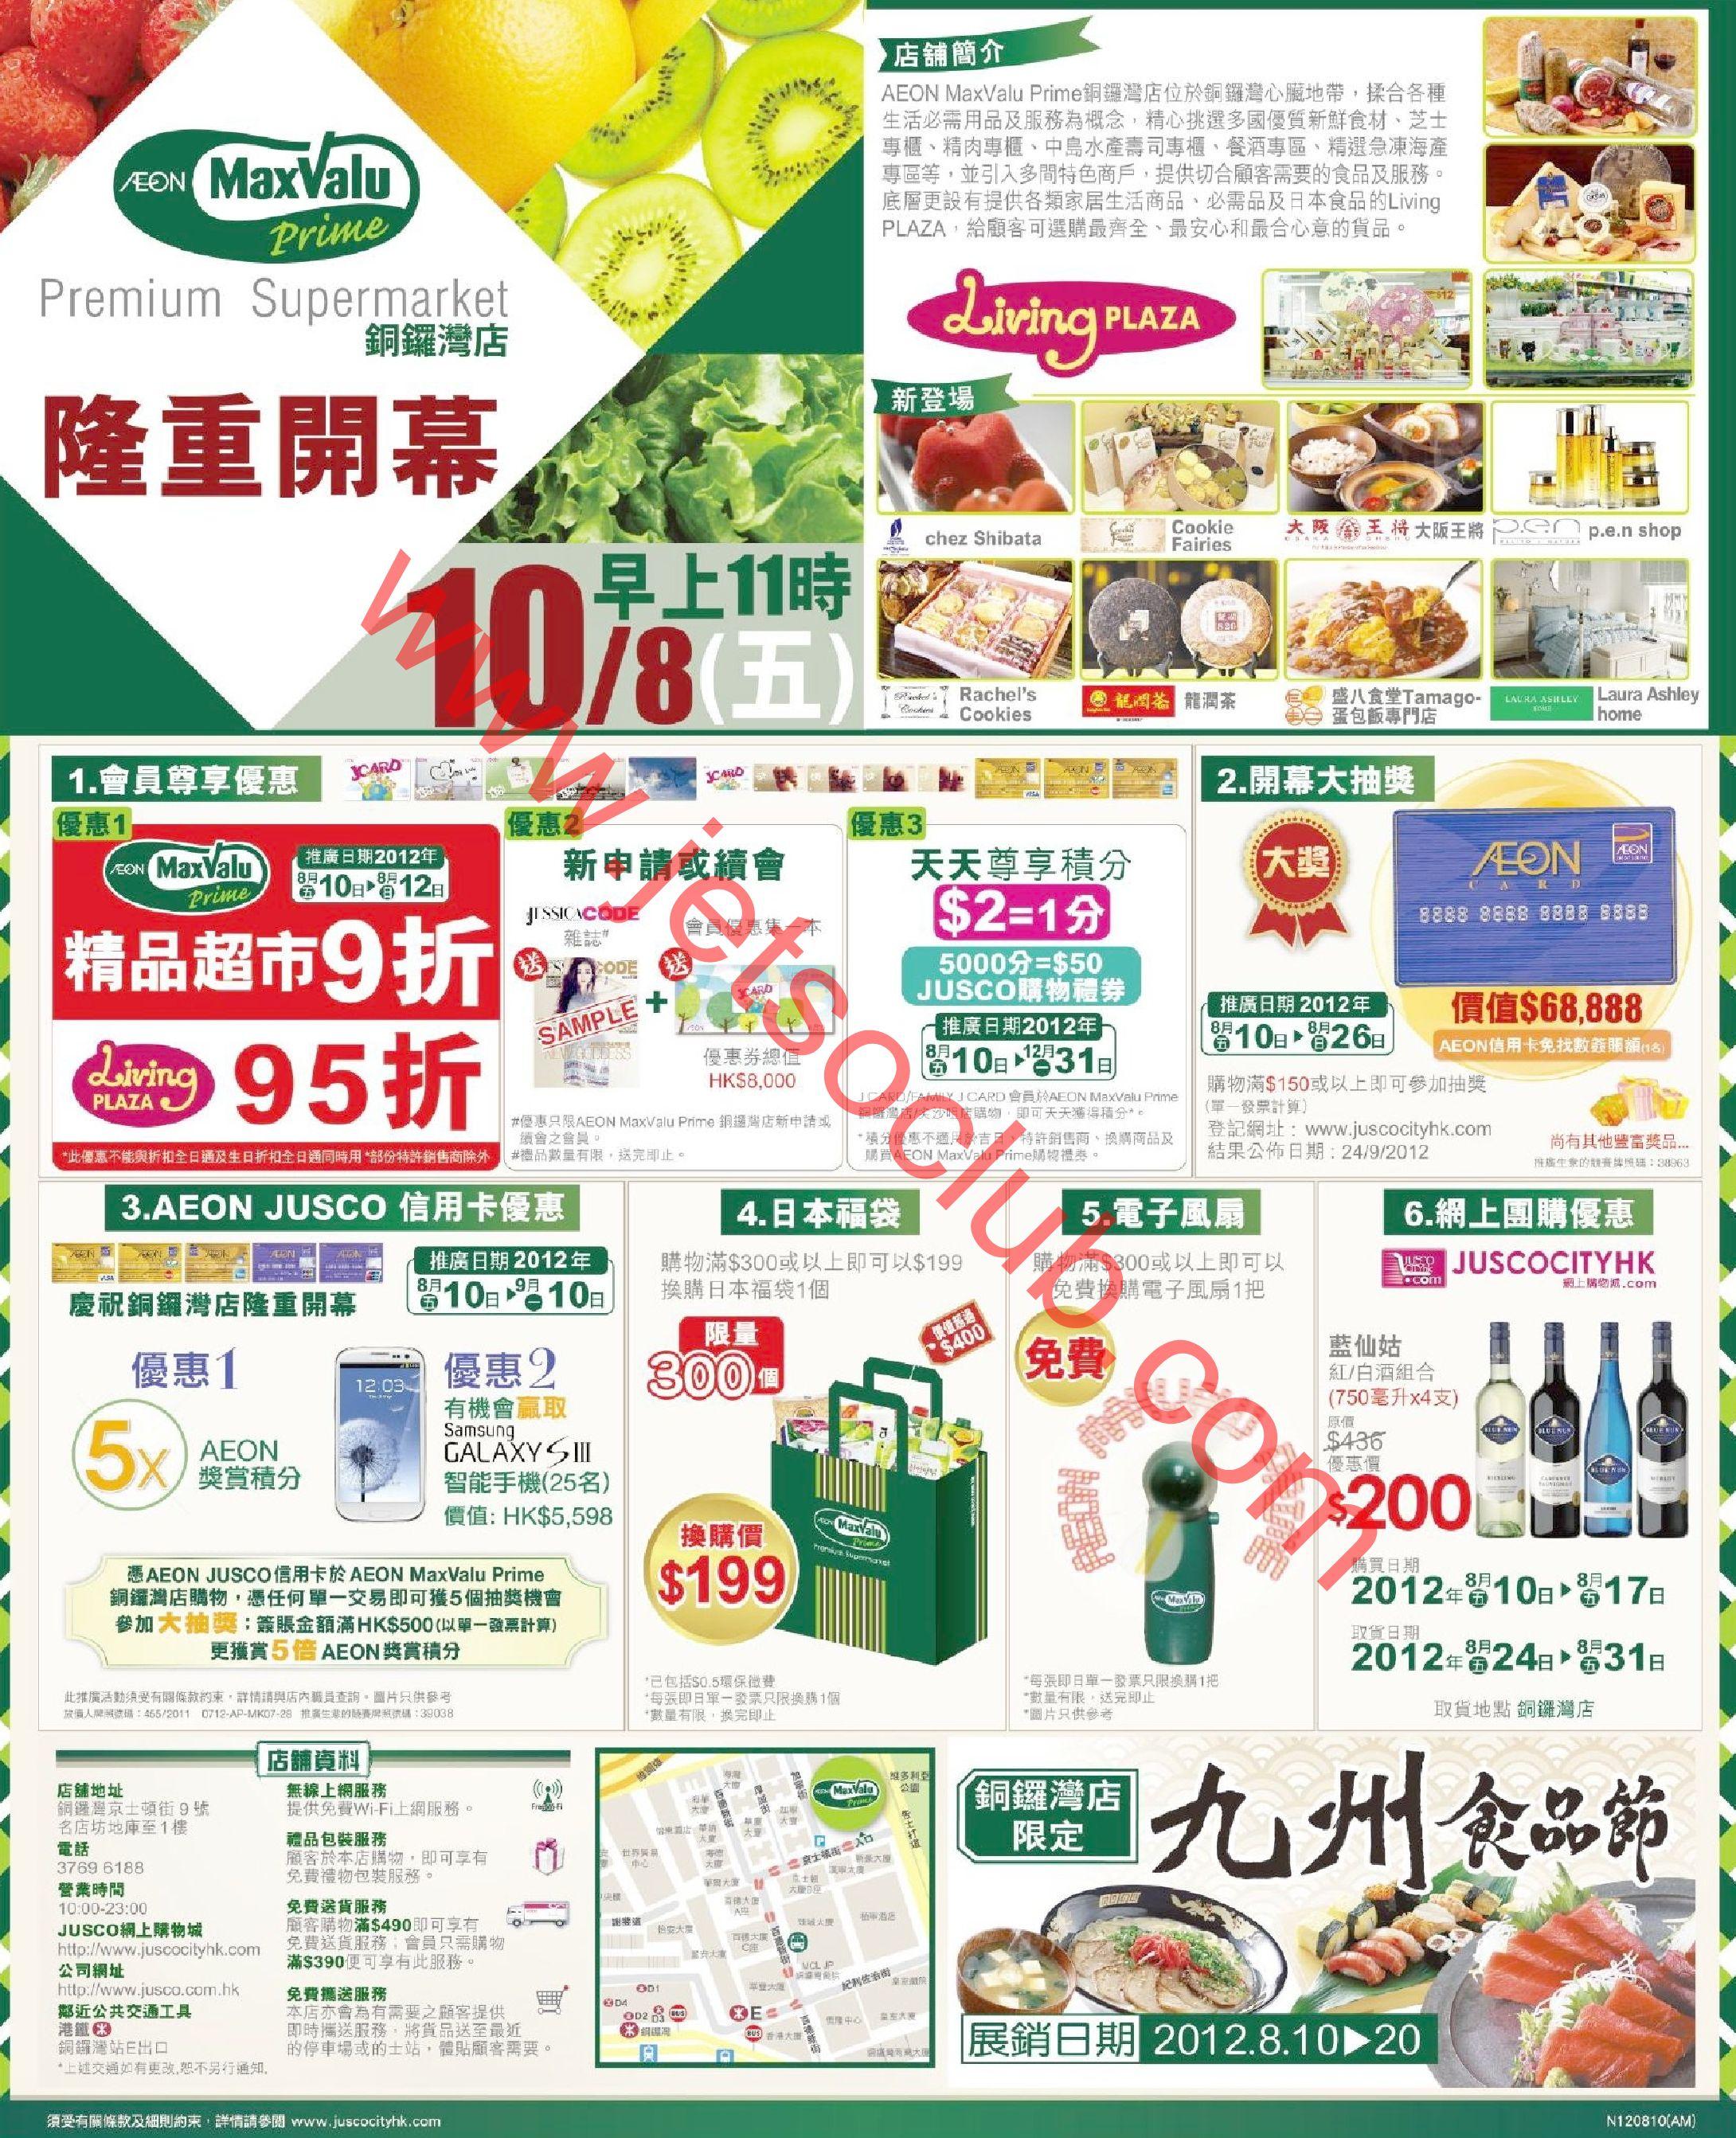 JUSCO:MaxValu超市銅鑼灣店開幕 9折優惠(至12/8)/ 九州食品節(至20/8) ( Jetso Club 著數俱樂部 )